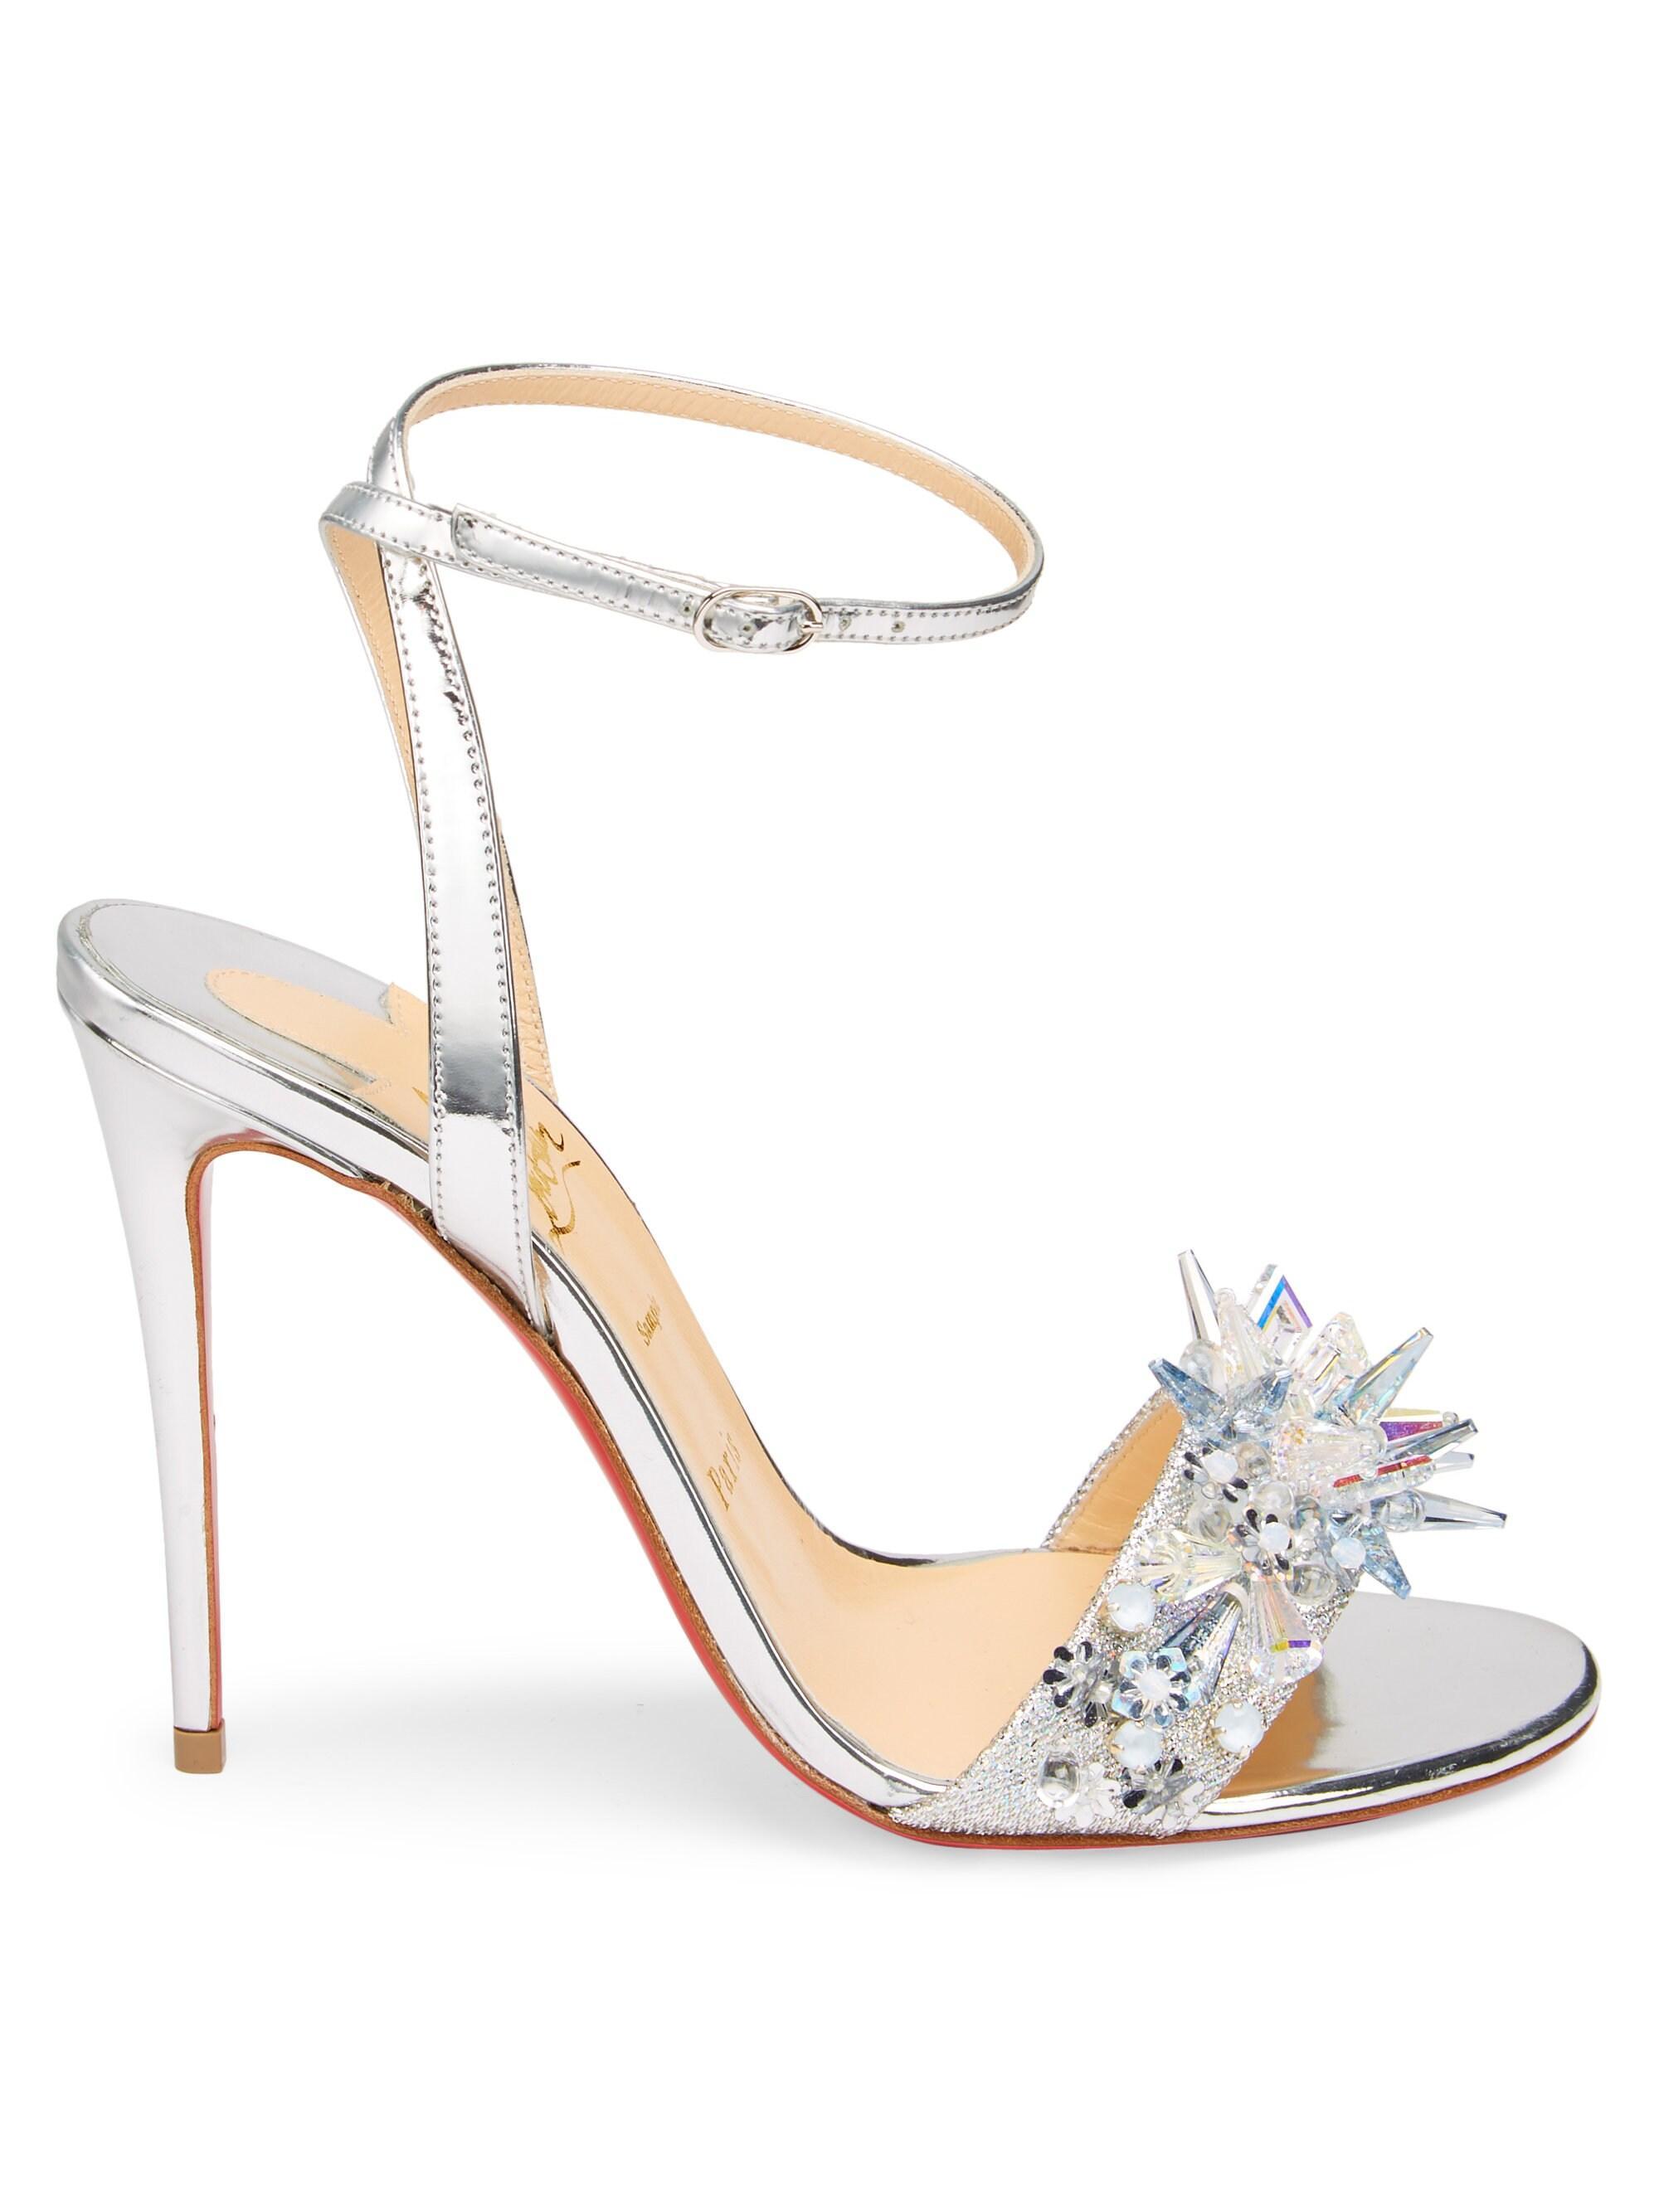 929ff5fdad5 Women's Okydok Lurex Metallic Leather Sandals